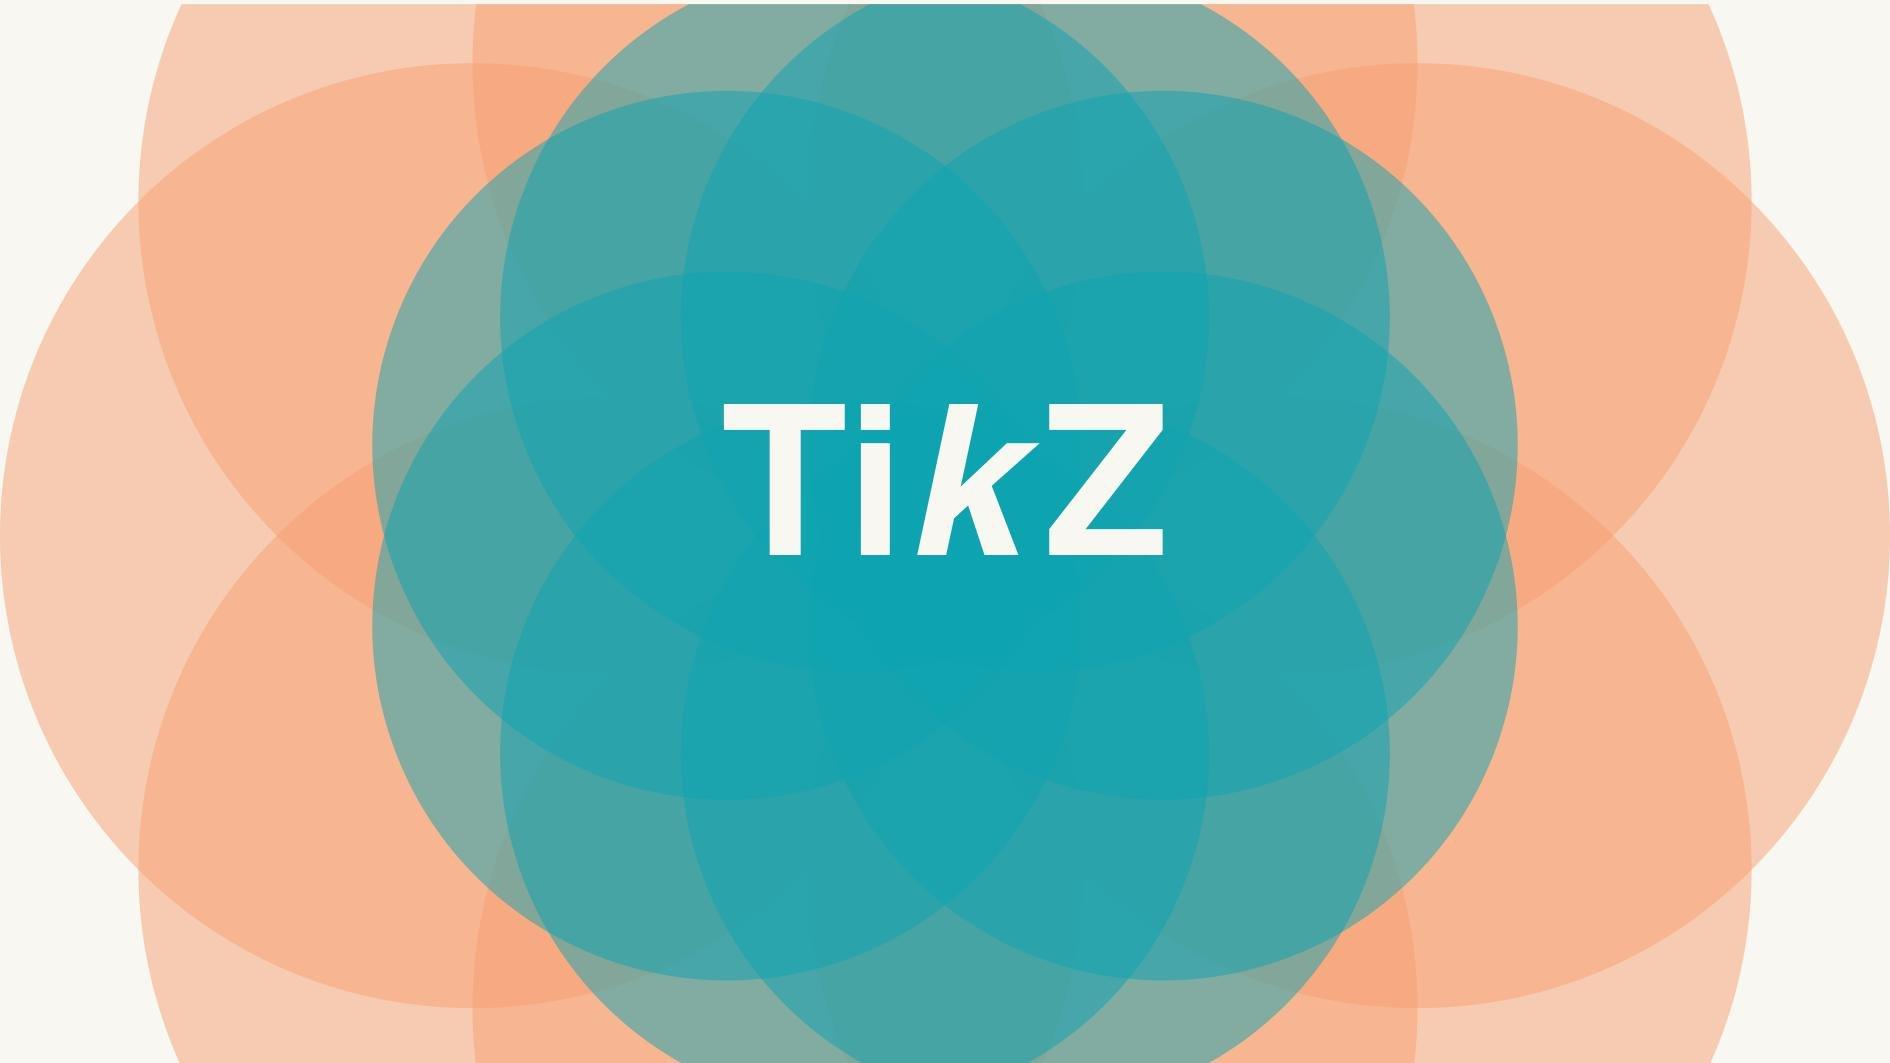 Creating Figures in LaTeX Using TikZ